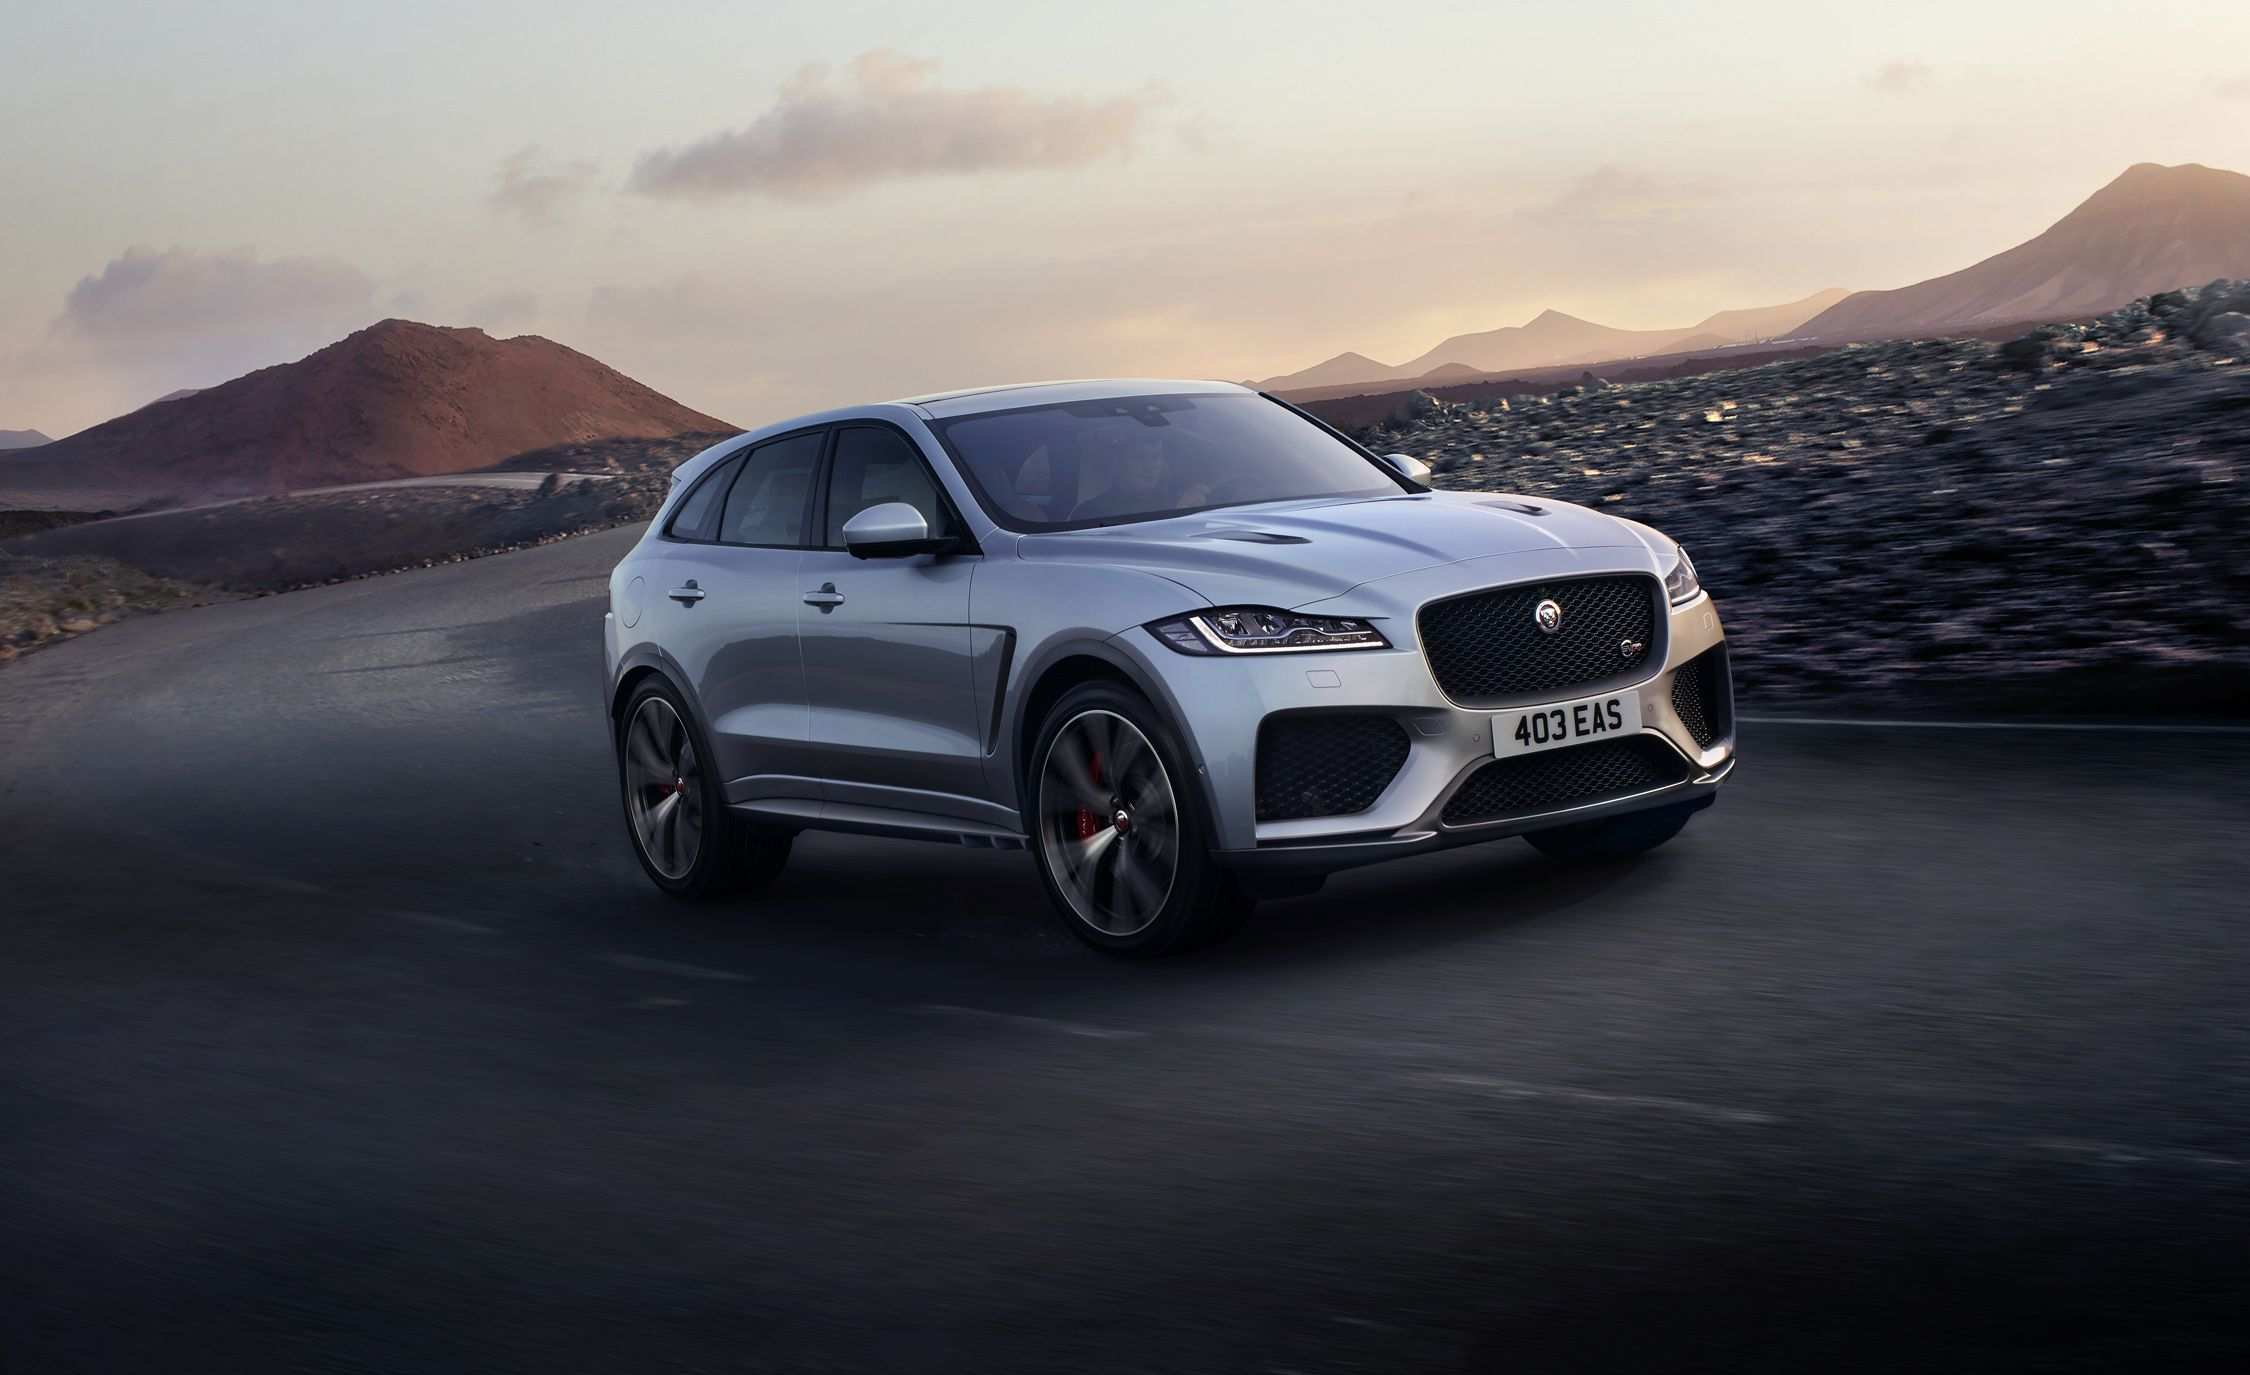 63 New 2019 Jaguar Suv Spesification by 2019 Jaguar Suv